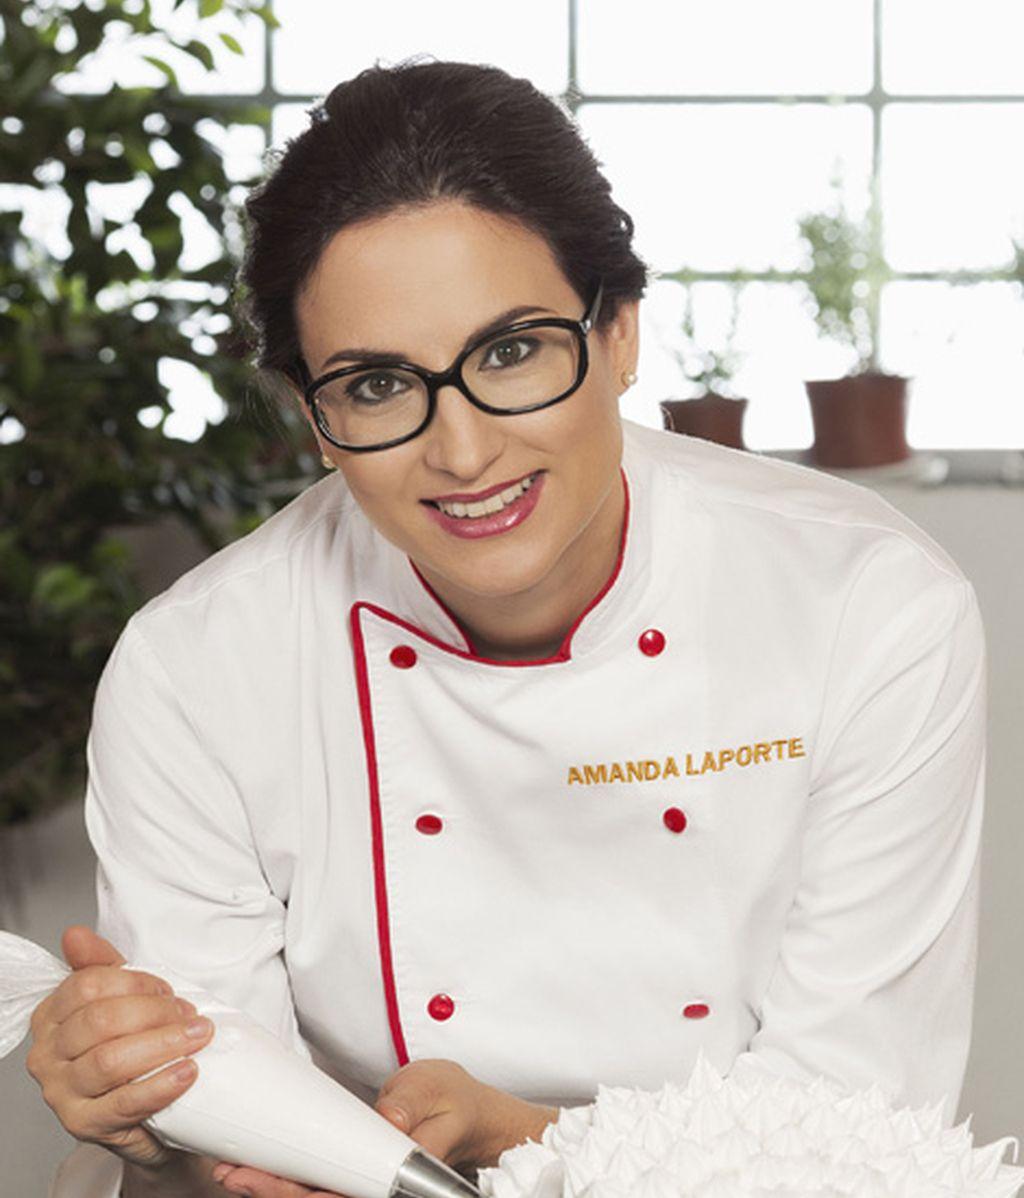 La mentora Amanda Laporte